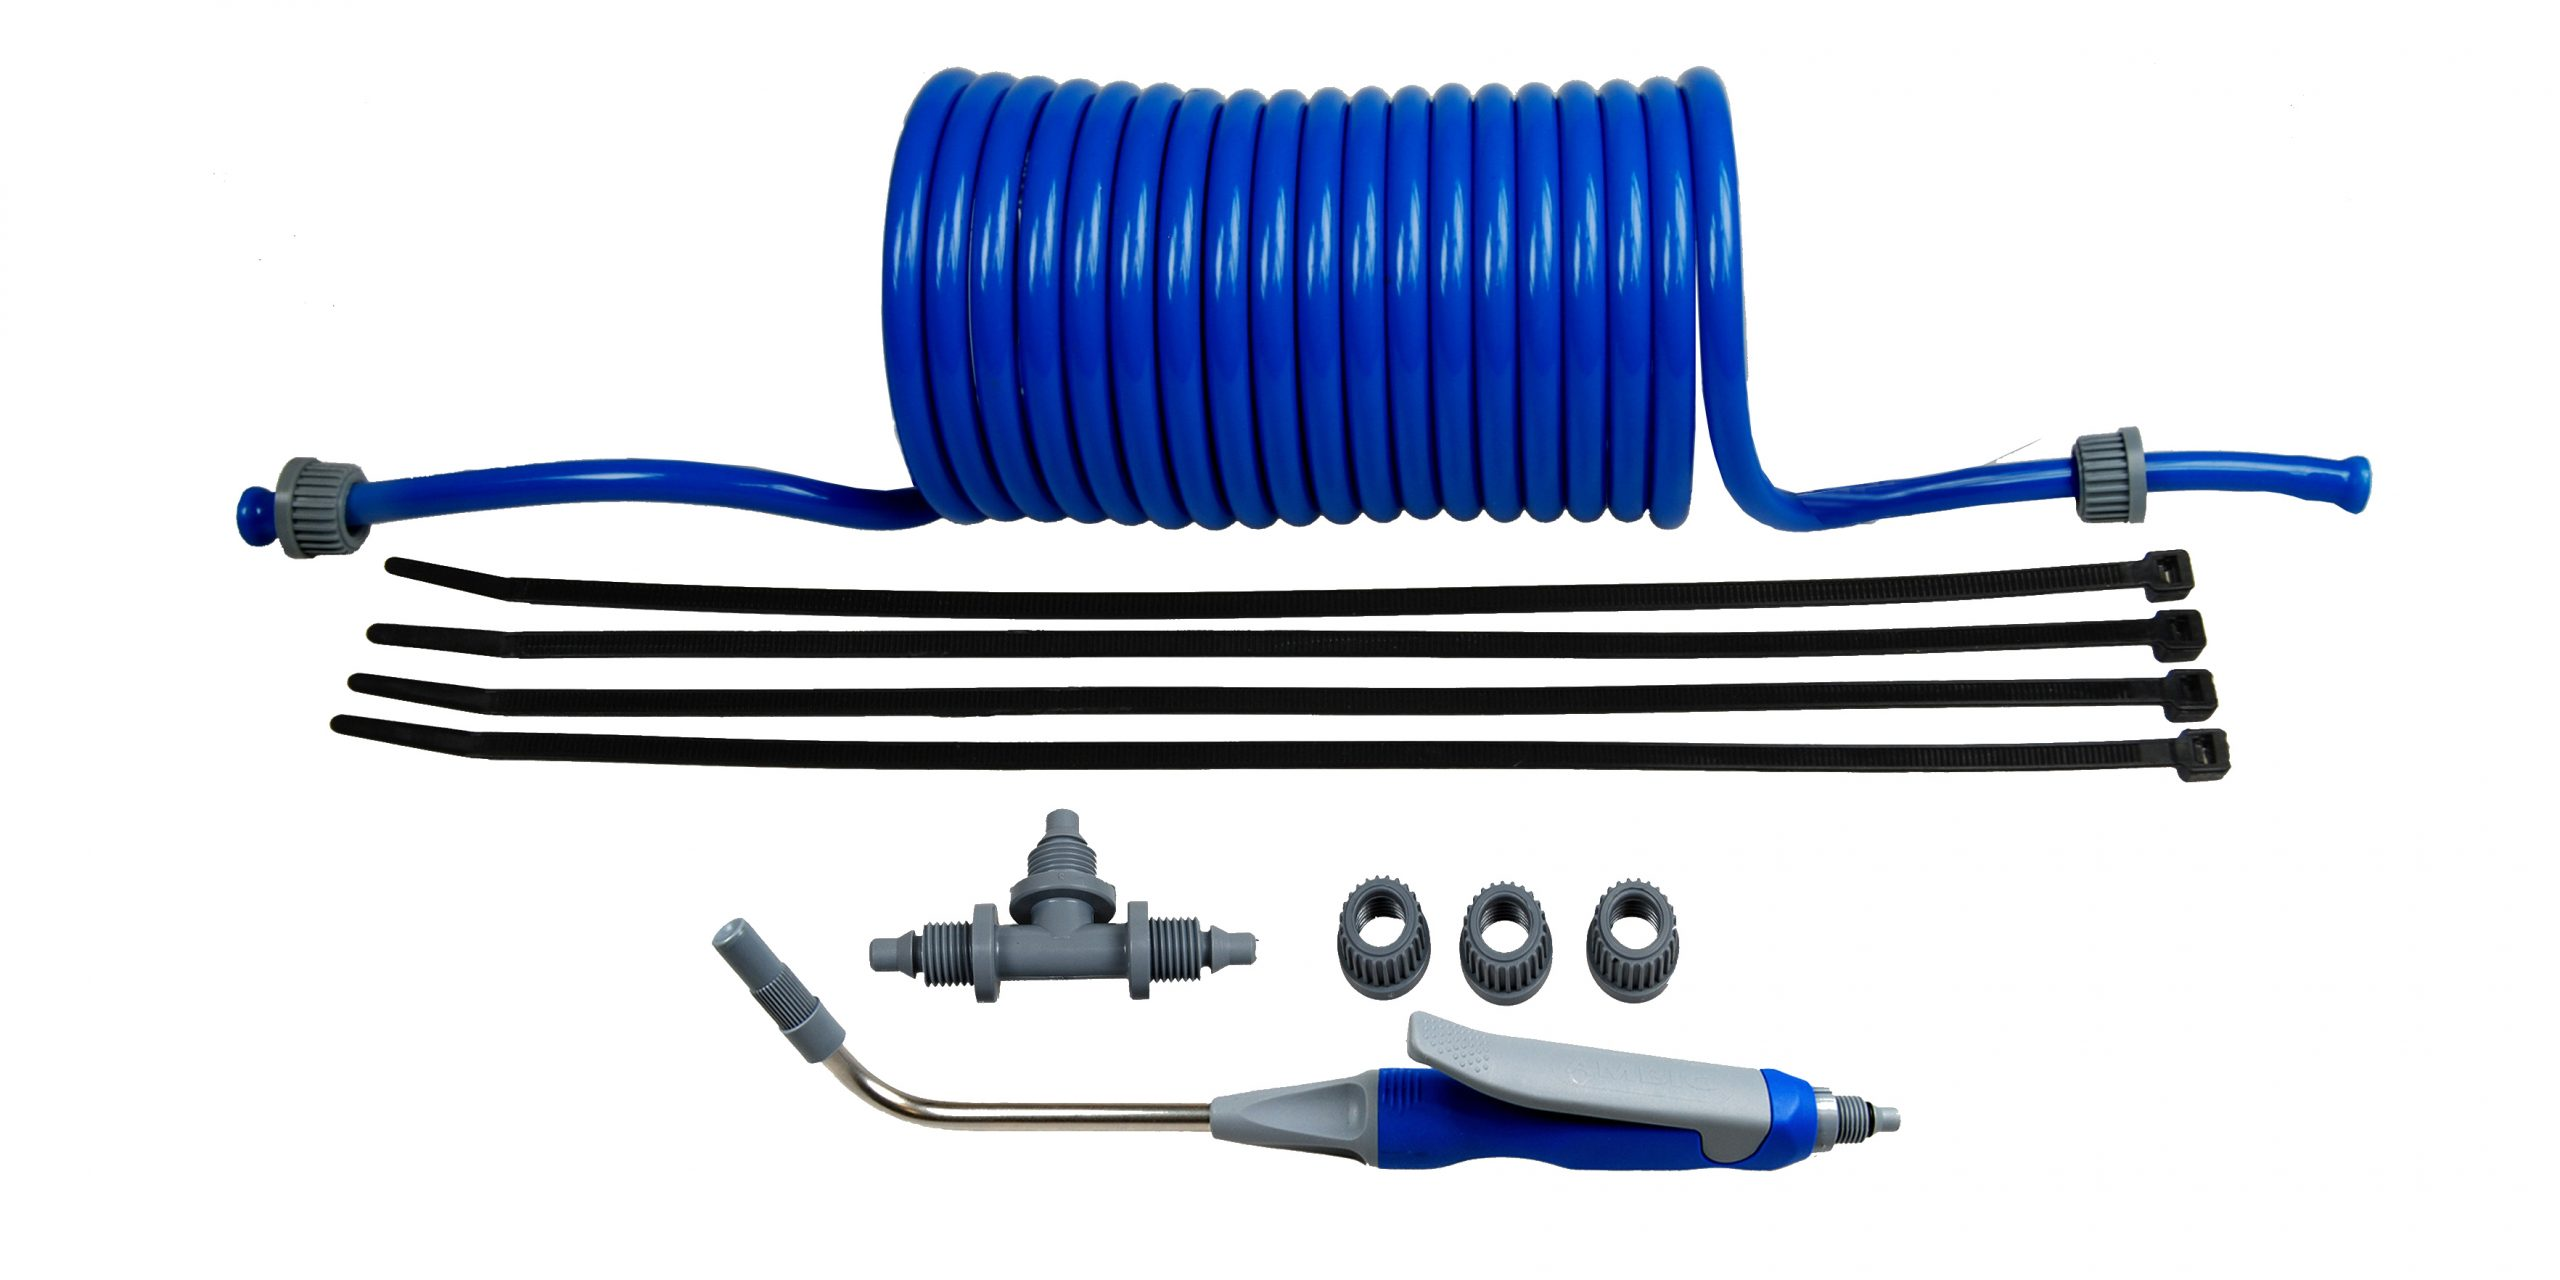 Image of Ambic Extension Kits and Spray Guns